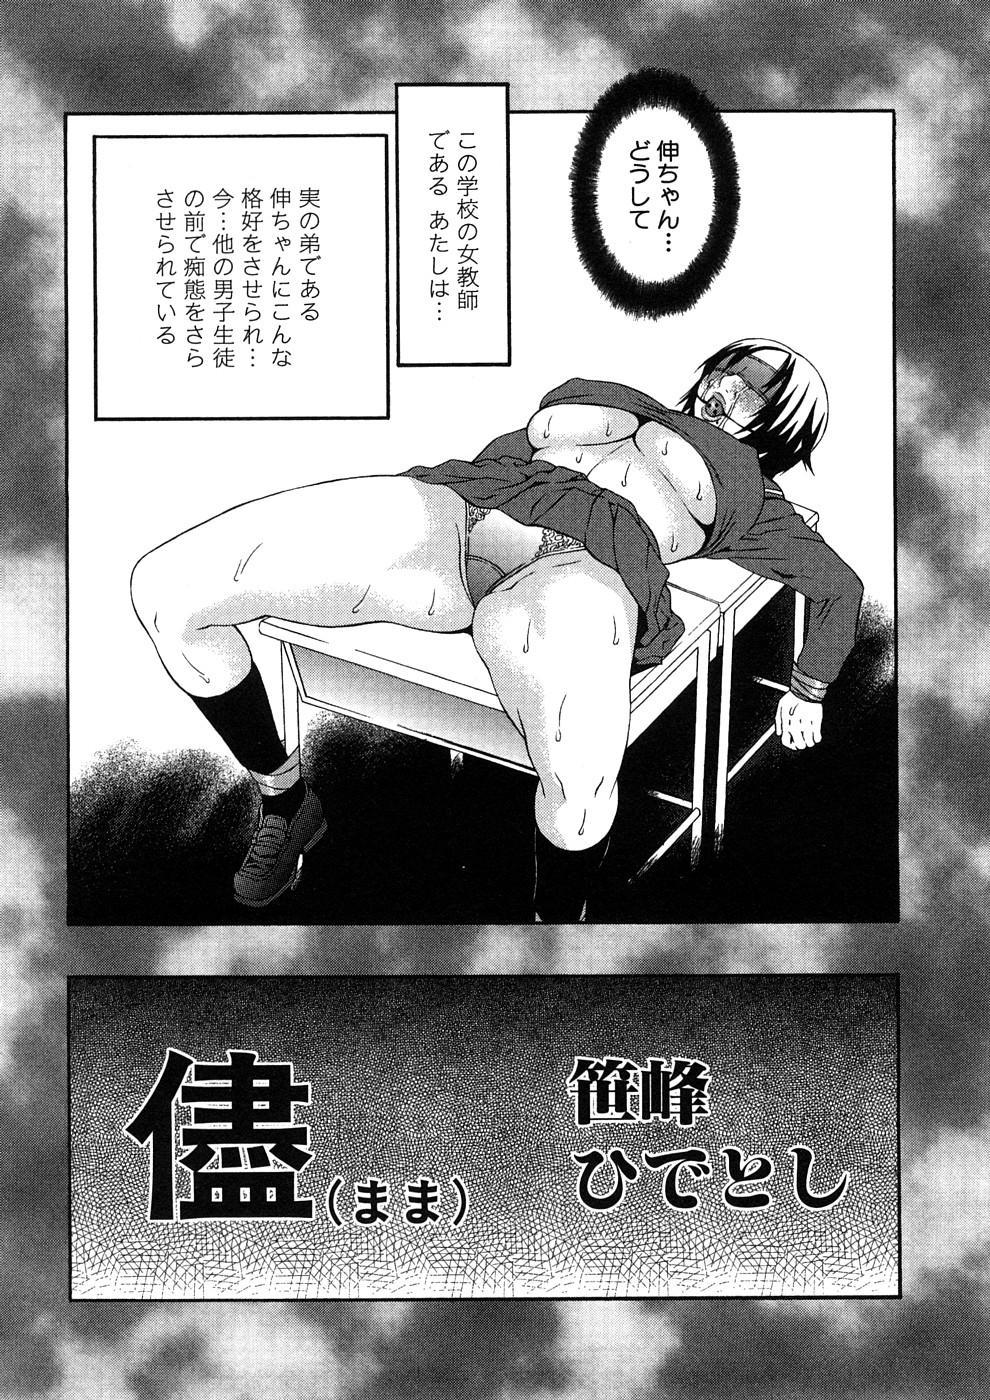 Geki Yaba Anthology Vol. 1 - Naka ni Dashite yo 188